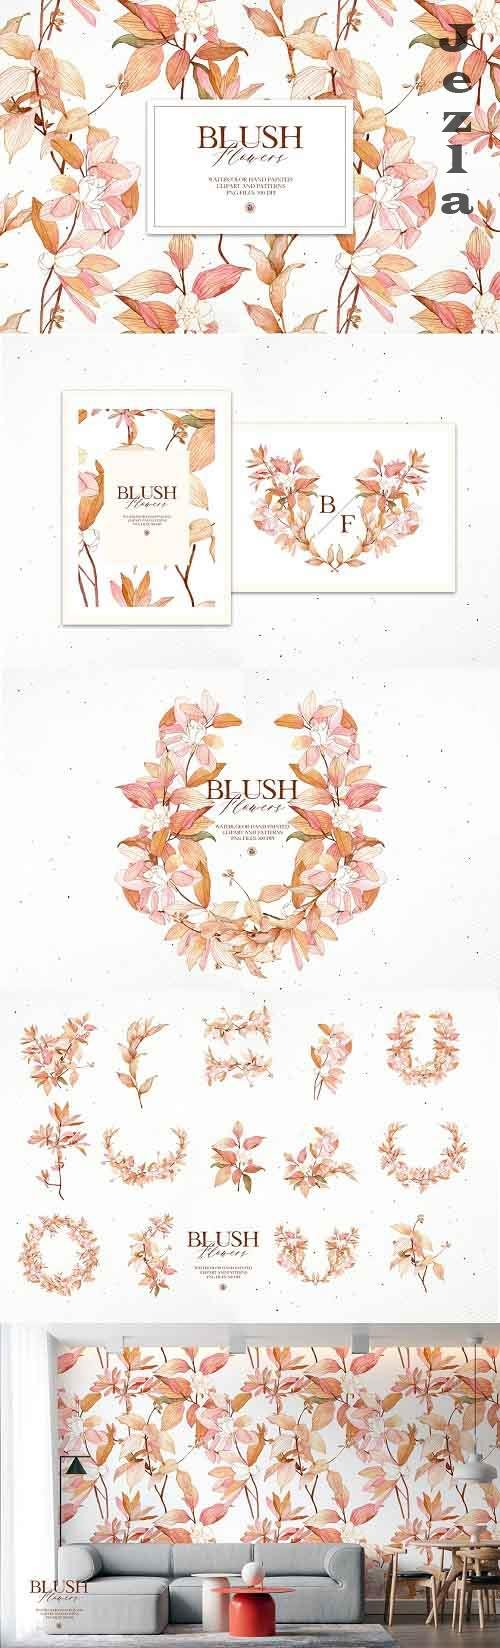 Blush Flowers - watercolor set - 5867753